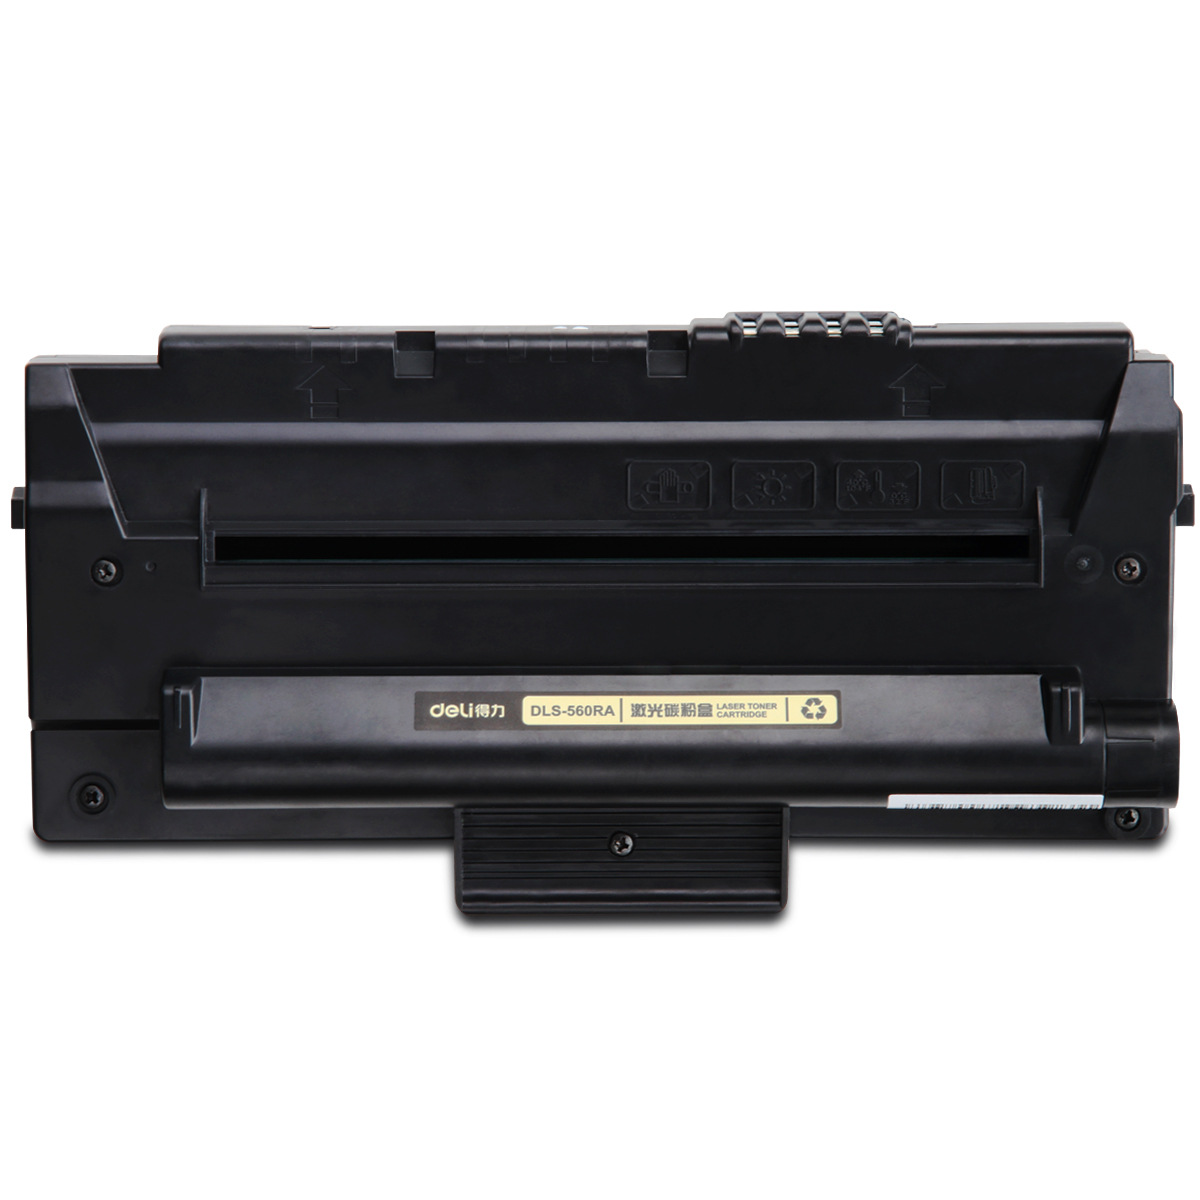 Effective DLS-560RA black toner (Samsung SF-560R/RC 565PR/PRC)